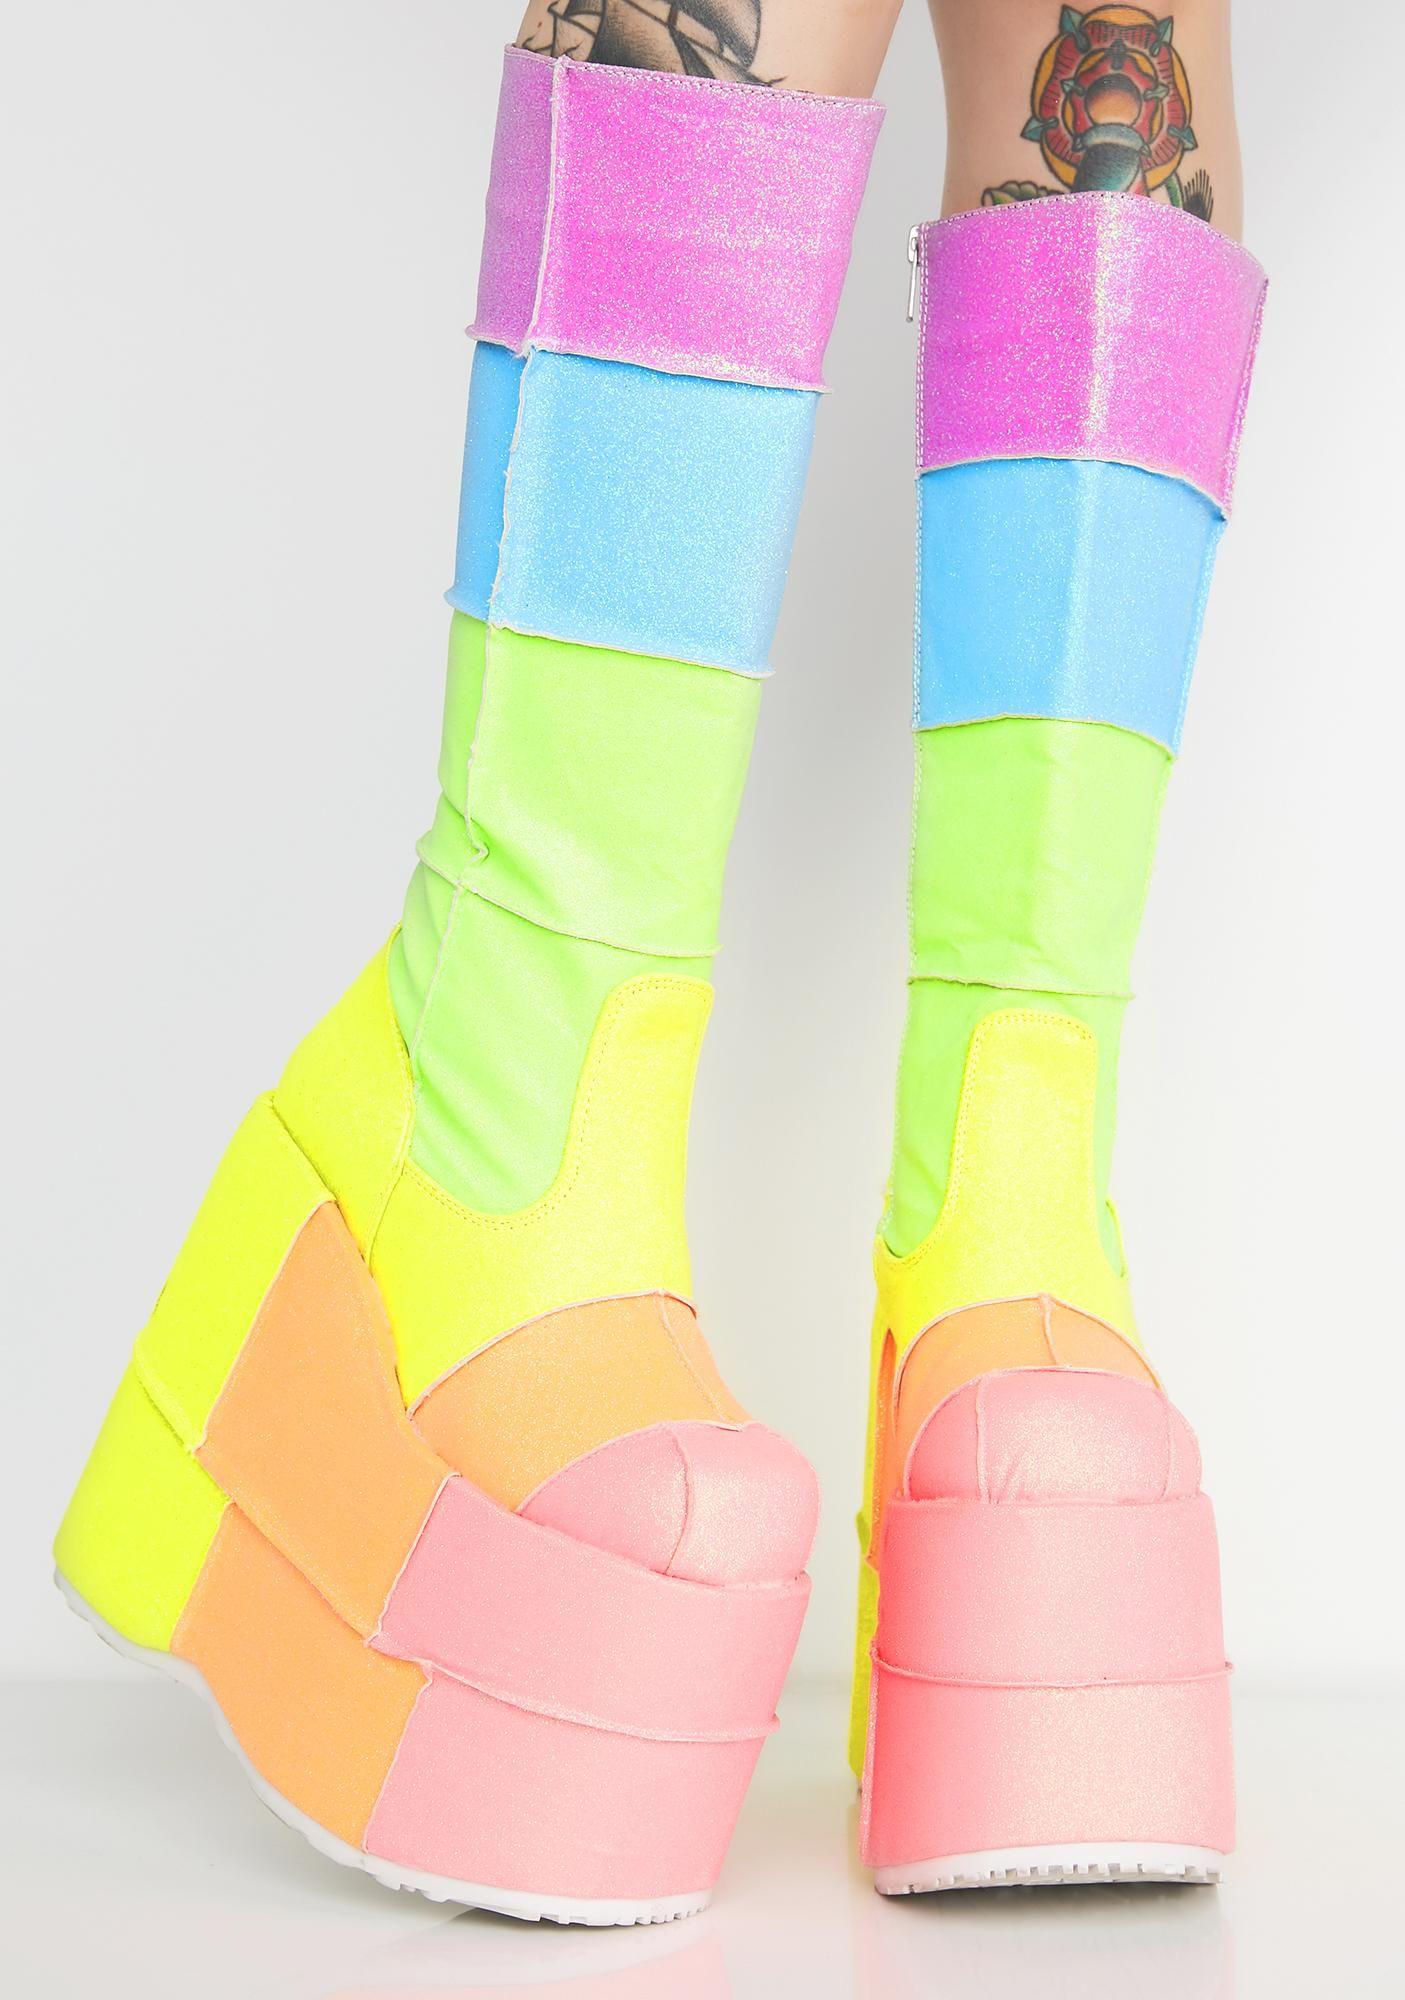 aaac3704cdd Higher Than The Rainbow UV Glitter Stacks